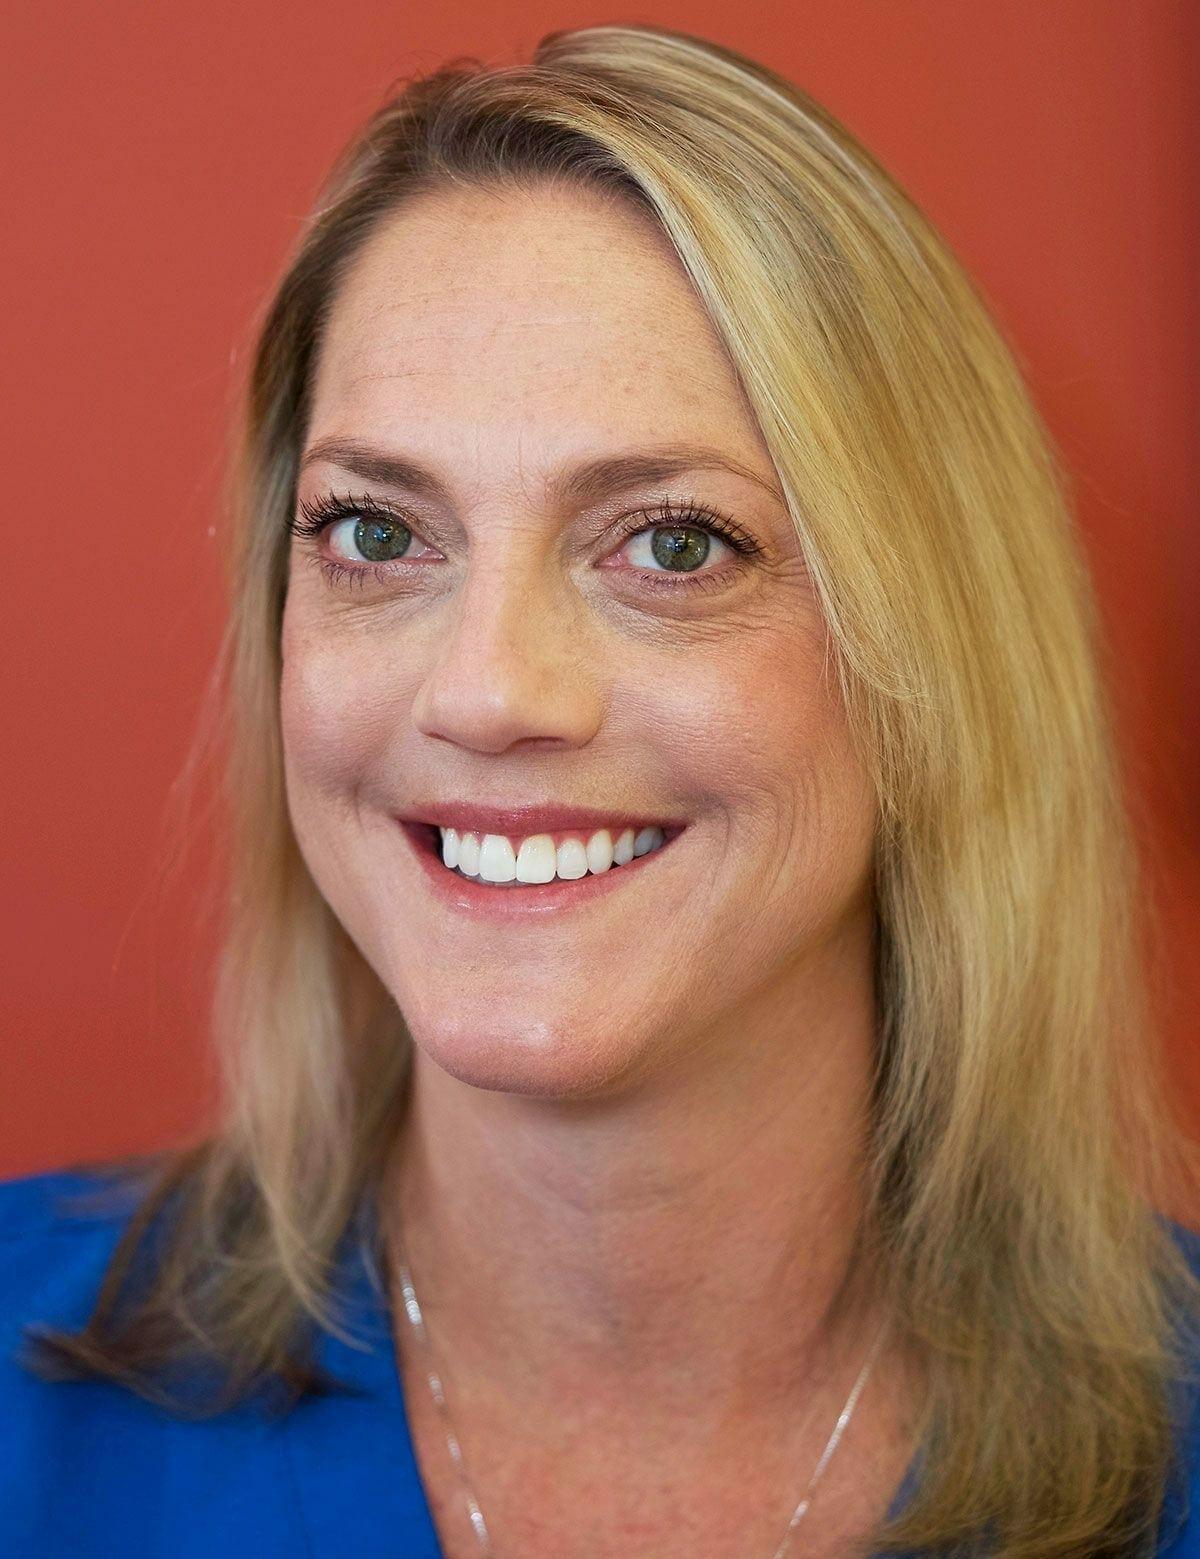 Jamiee, Lead Dental Assistant